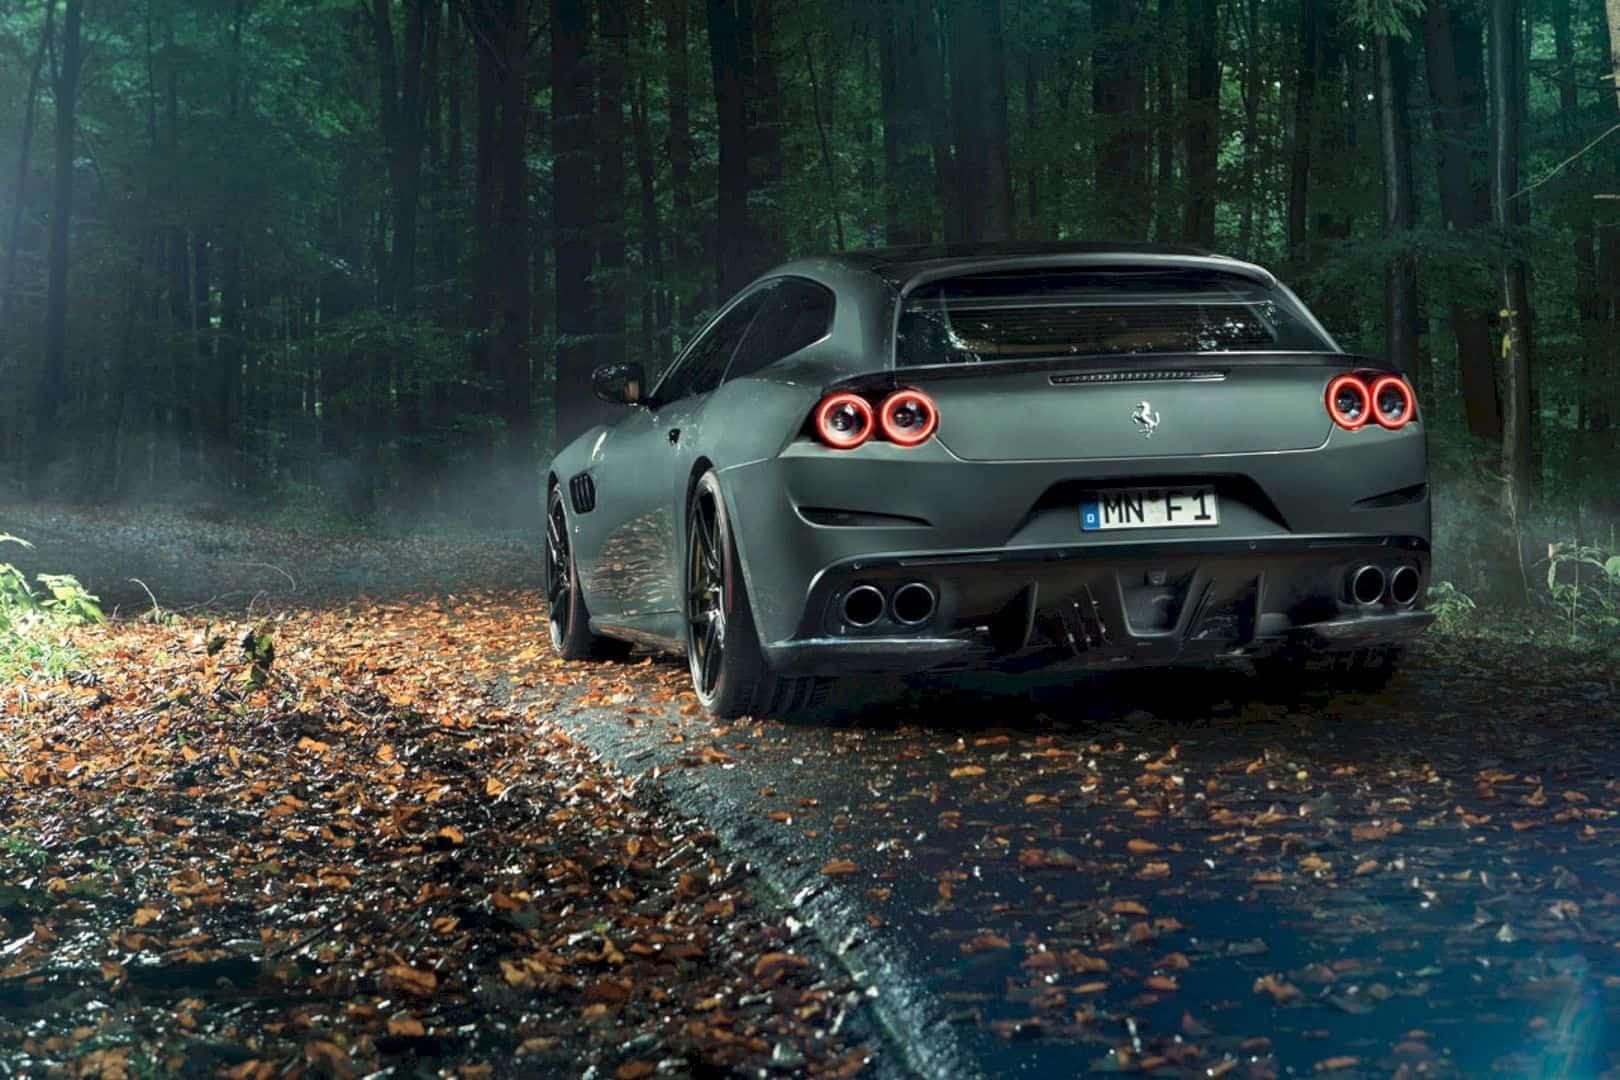 Ferrari Gtc4 Lusso By Novitec 6